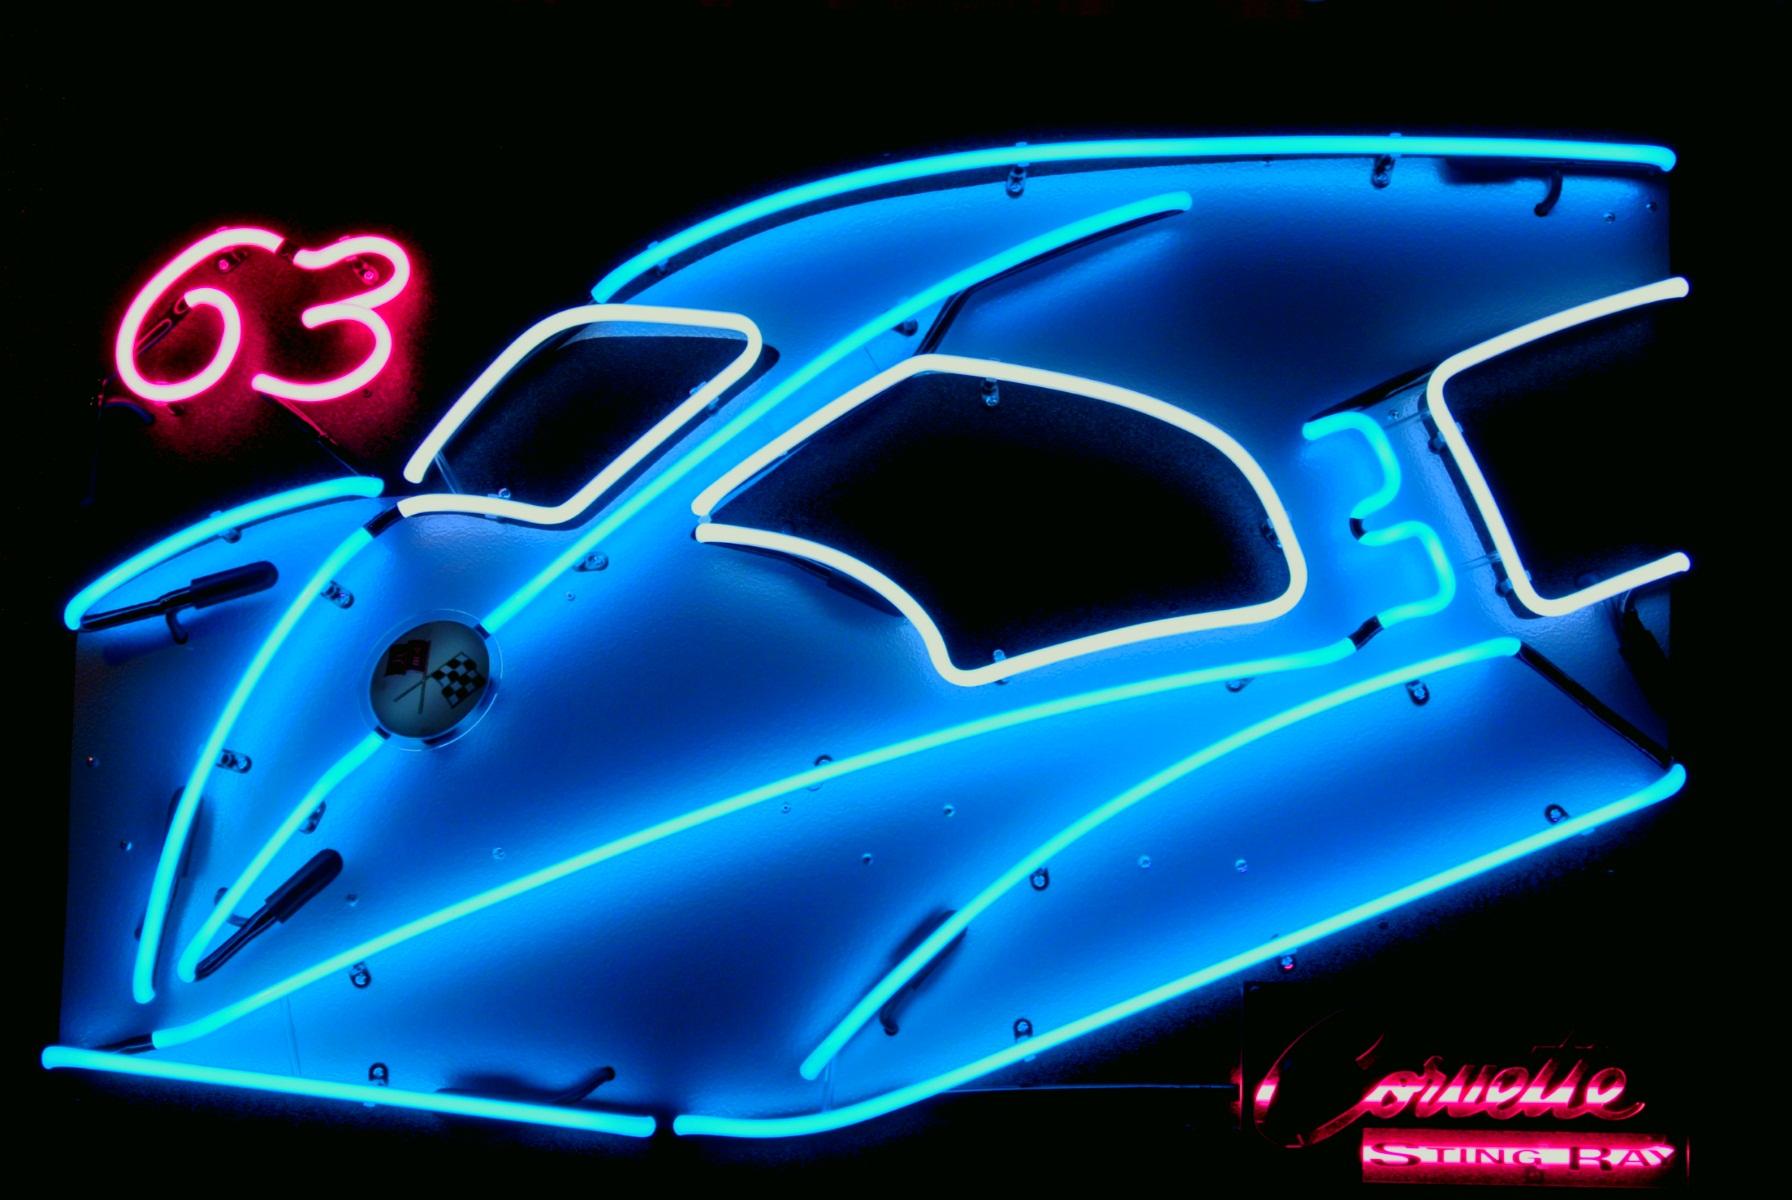 Custom Automotive Neon Art Sculptures by John Barton - Famous USA Neon Glass Artist - BartonNeonMagic.com